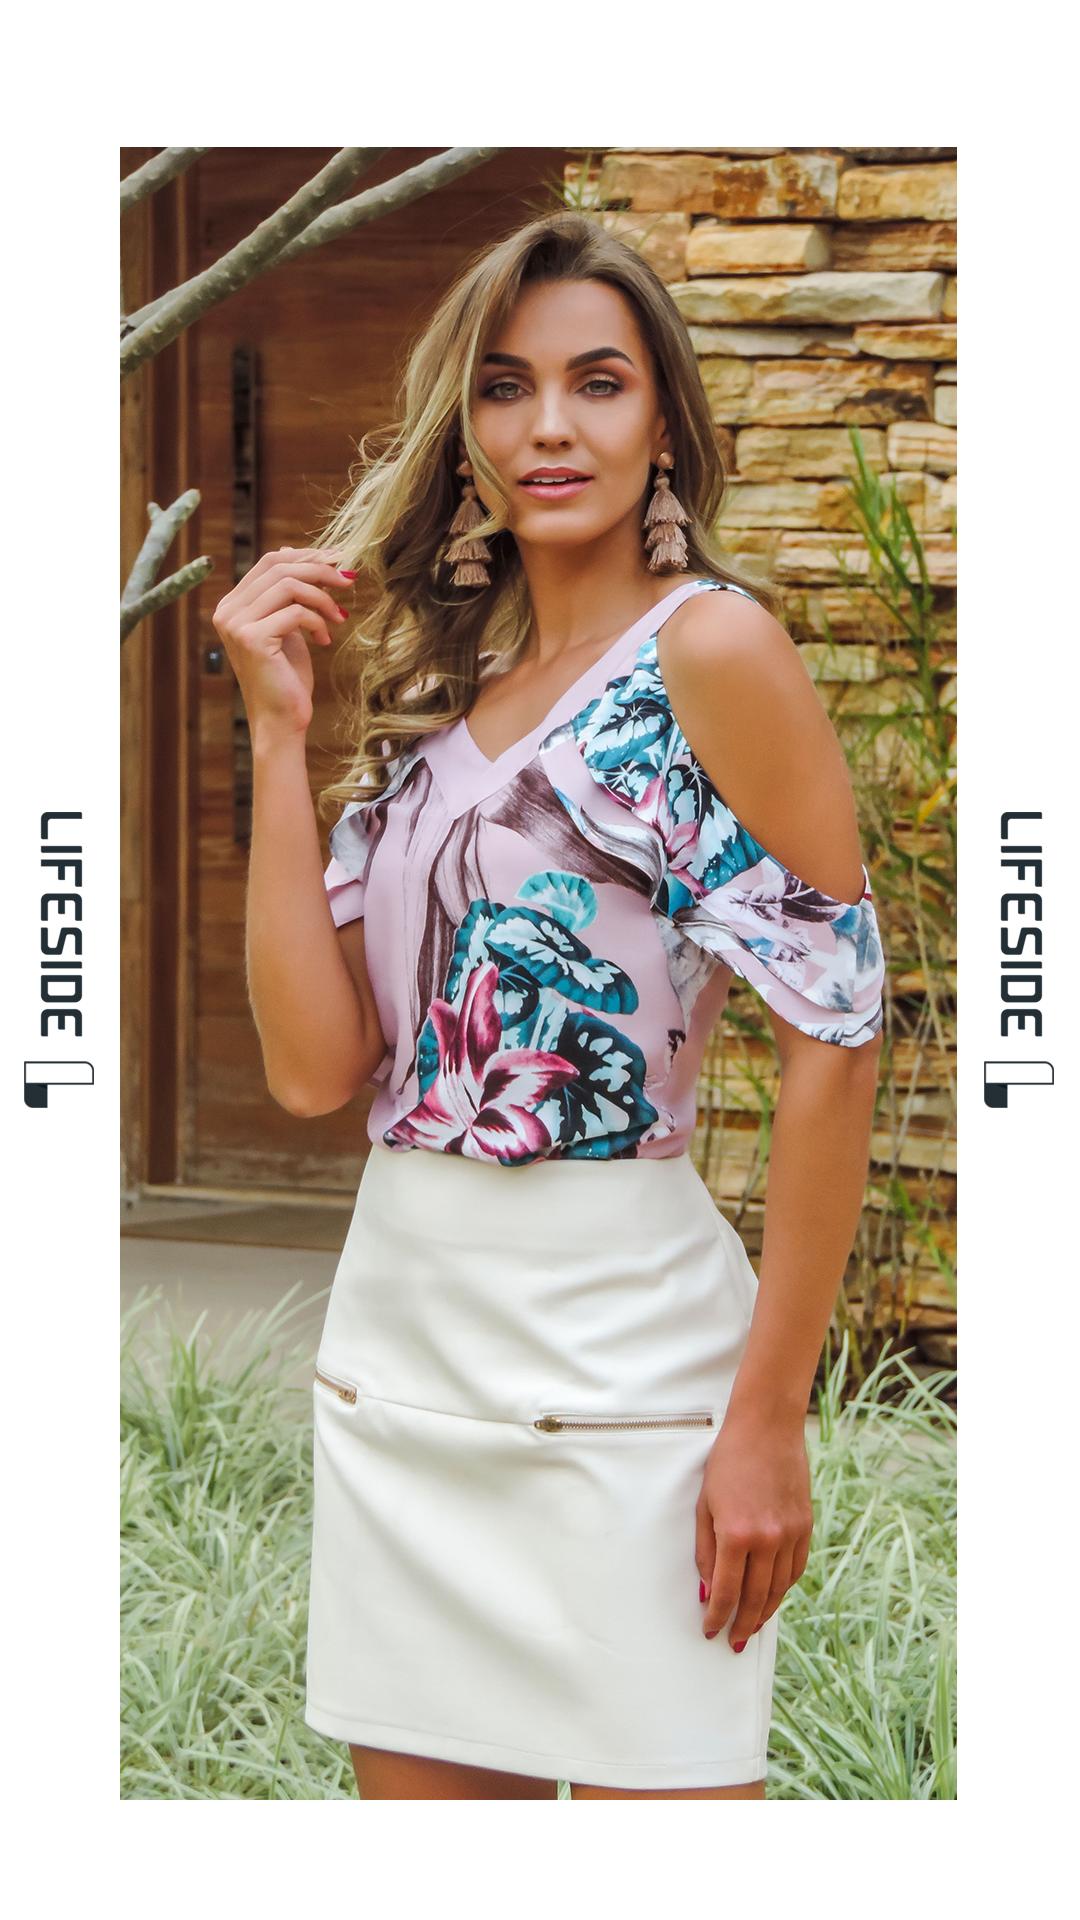 80d360fb7 LIFESIDE | Moda Feminina Primavera 2019. Blusa rosa estampada com saia  branca. Cut out